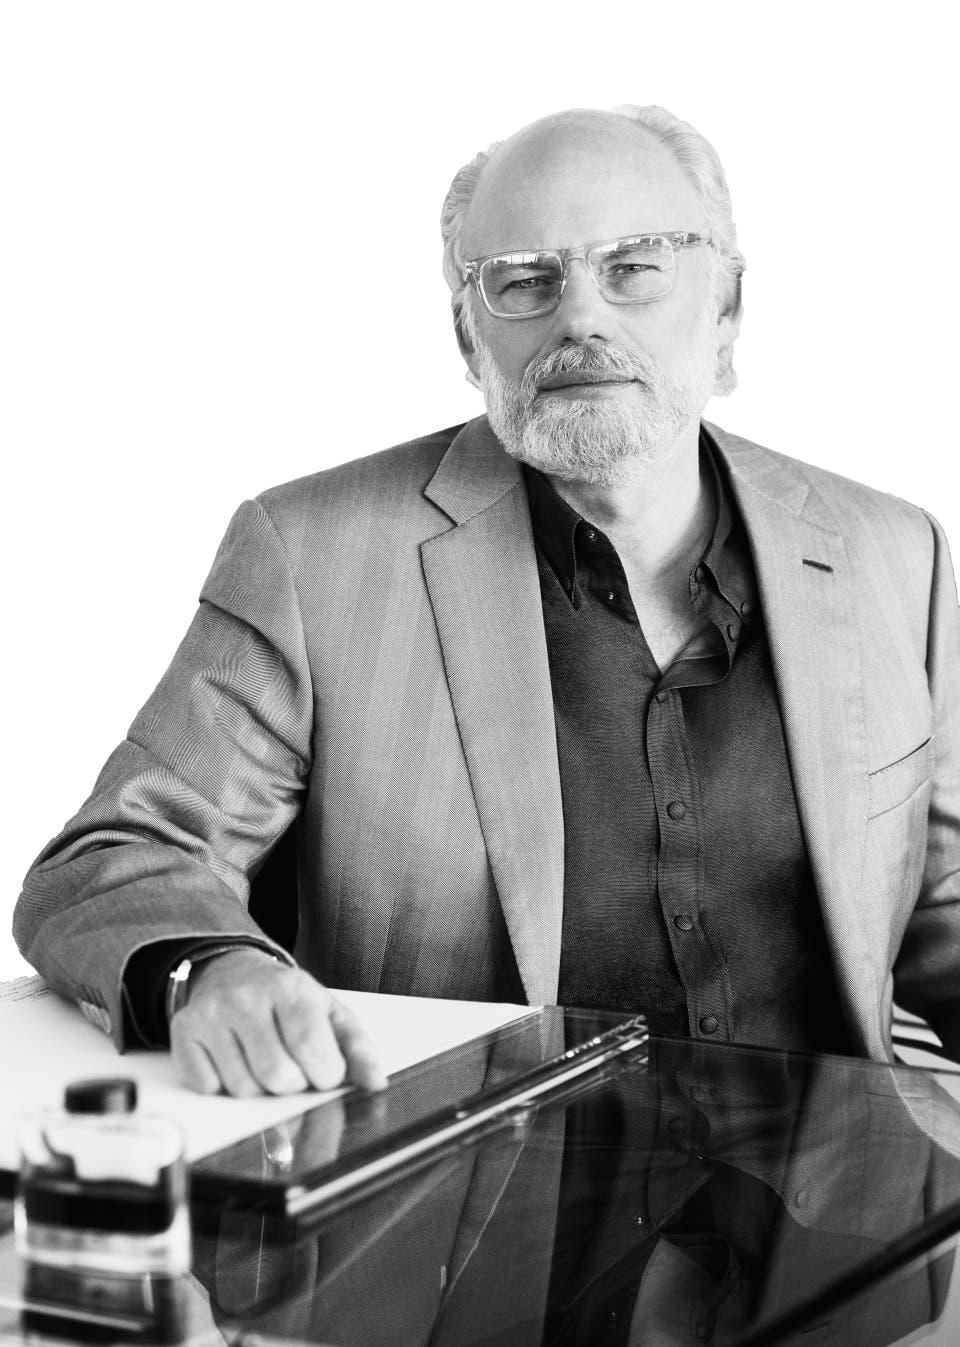 Gordon Bowen, Chief Creative Officer, Dentsu Aegis Network and Chairman mcgarrybowen